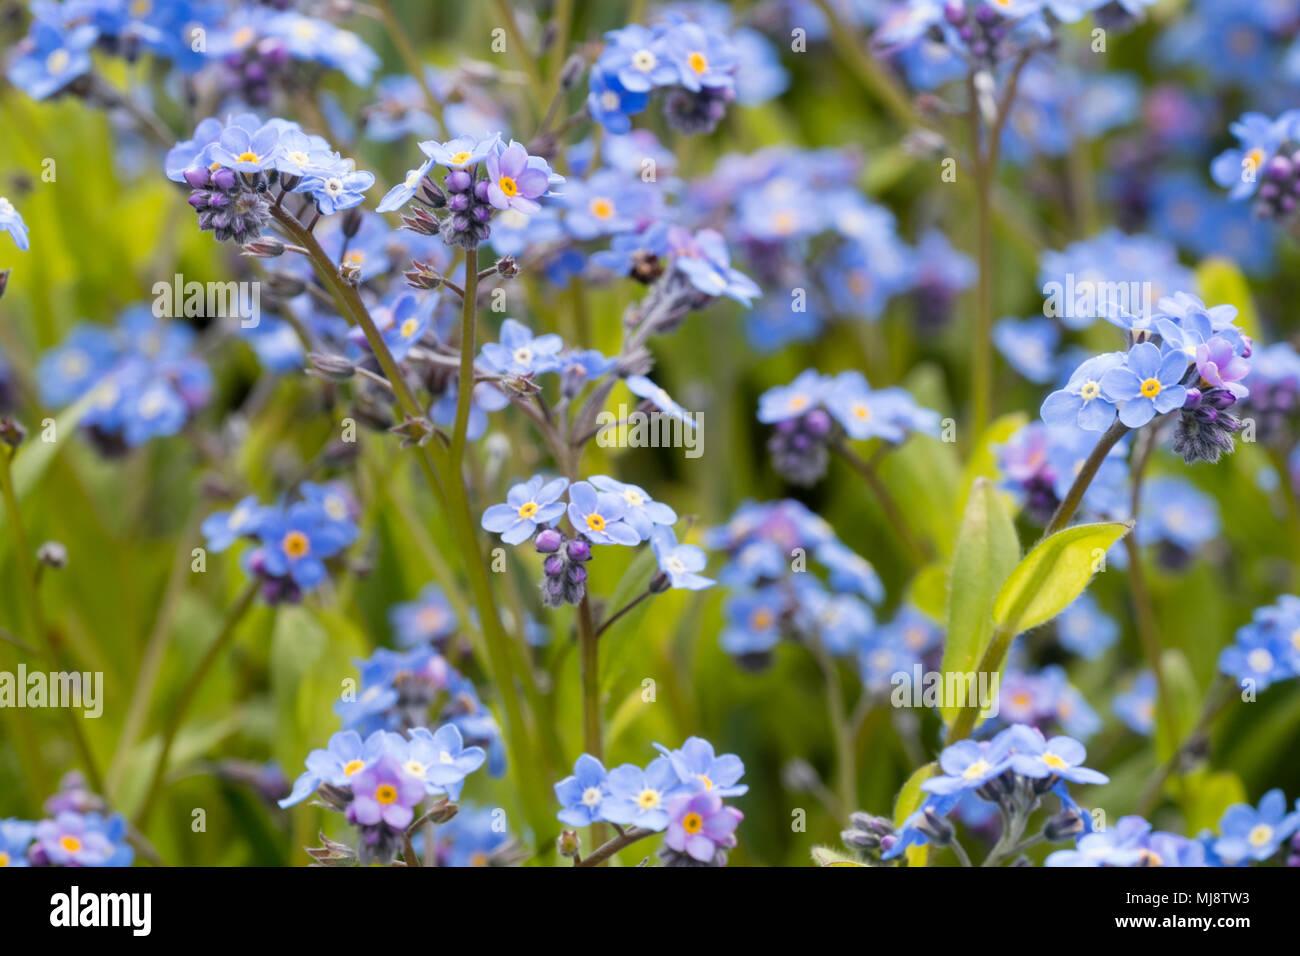 Blue spring flowers of the biennial cottage garden wood forget me not, Myosotis sylvatica - Stock Image